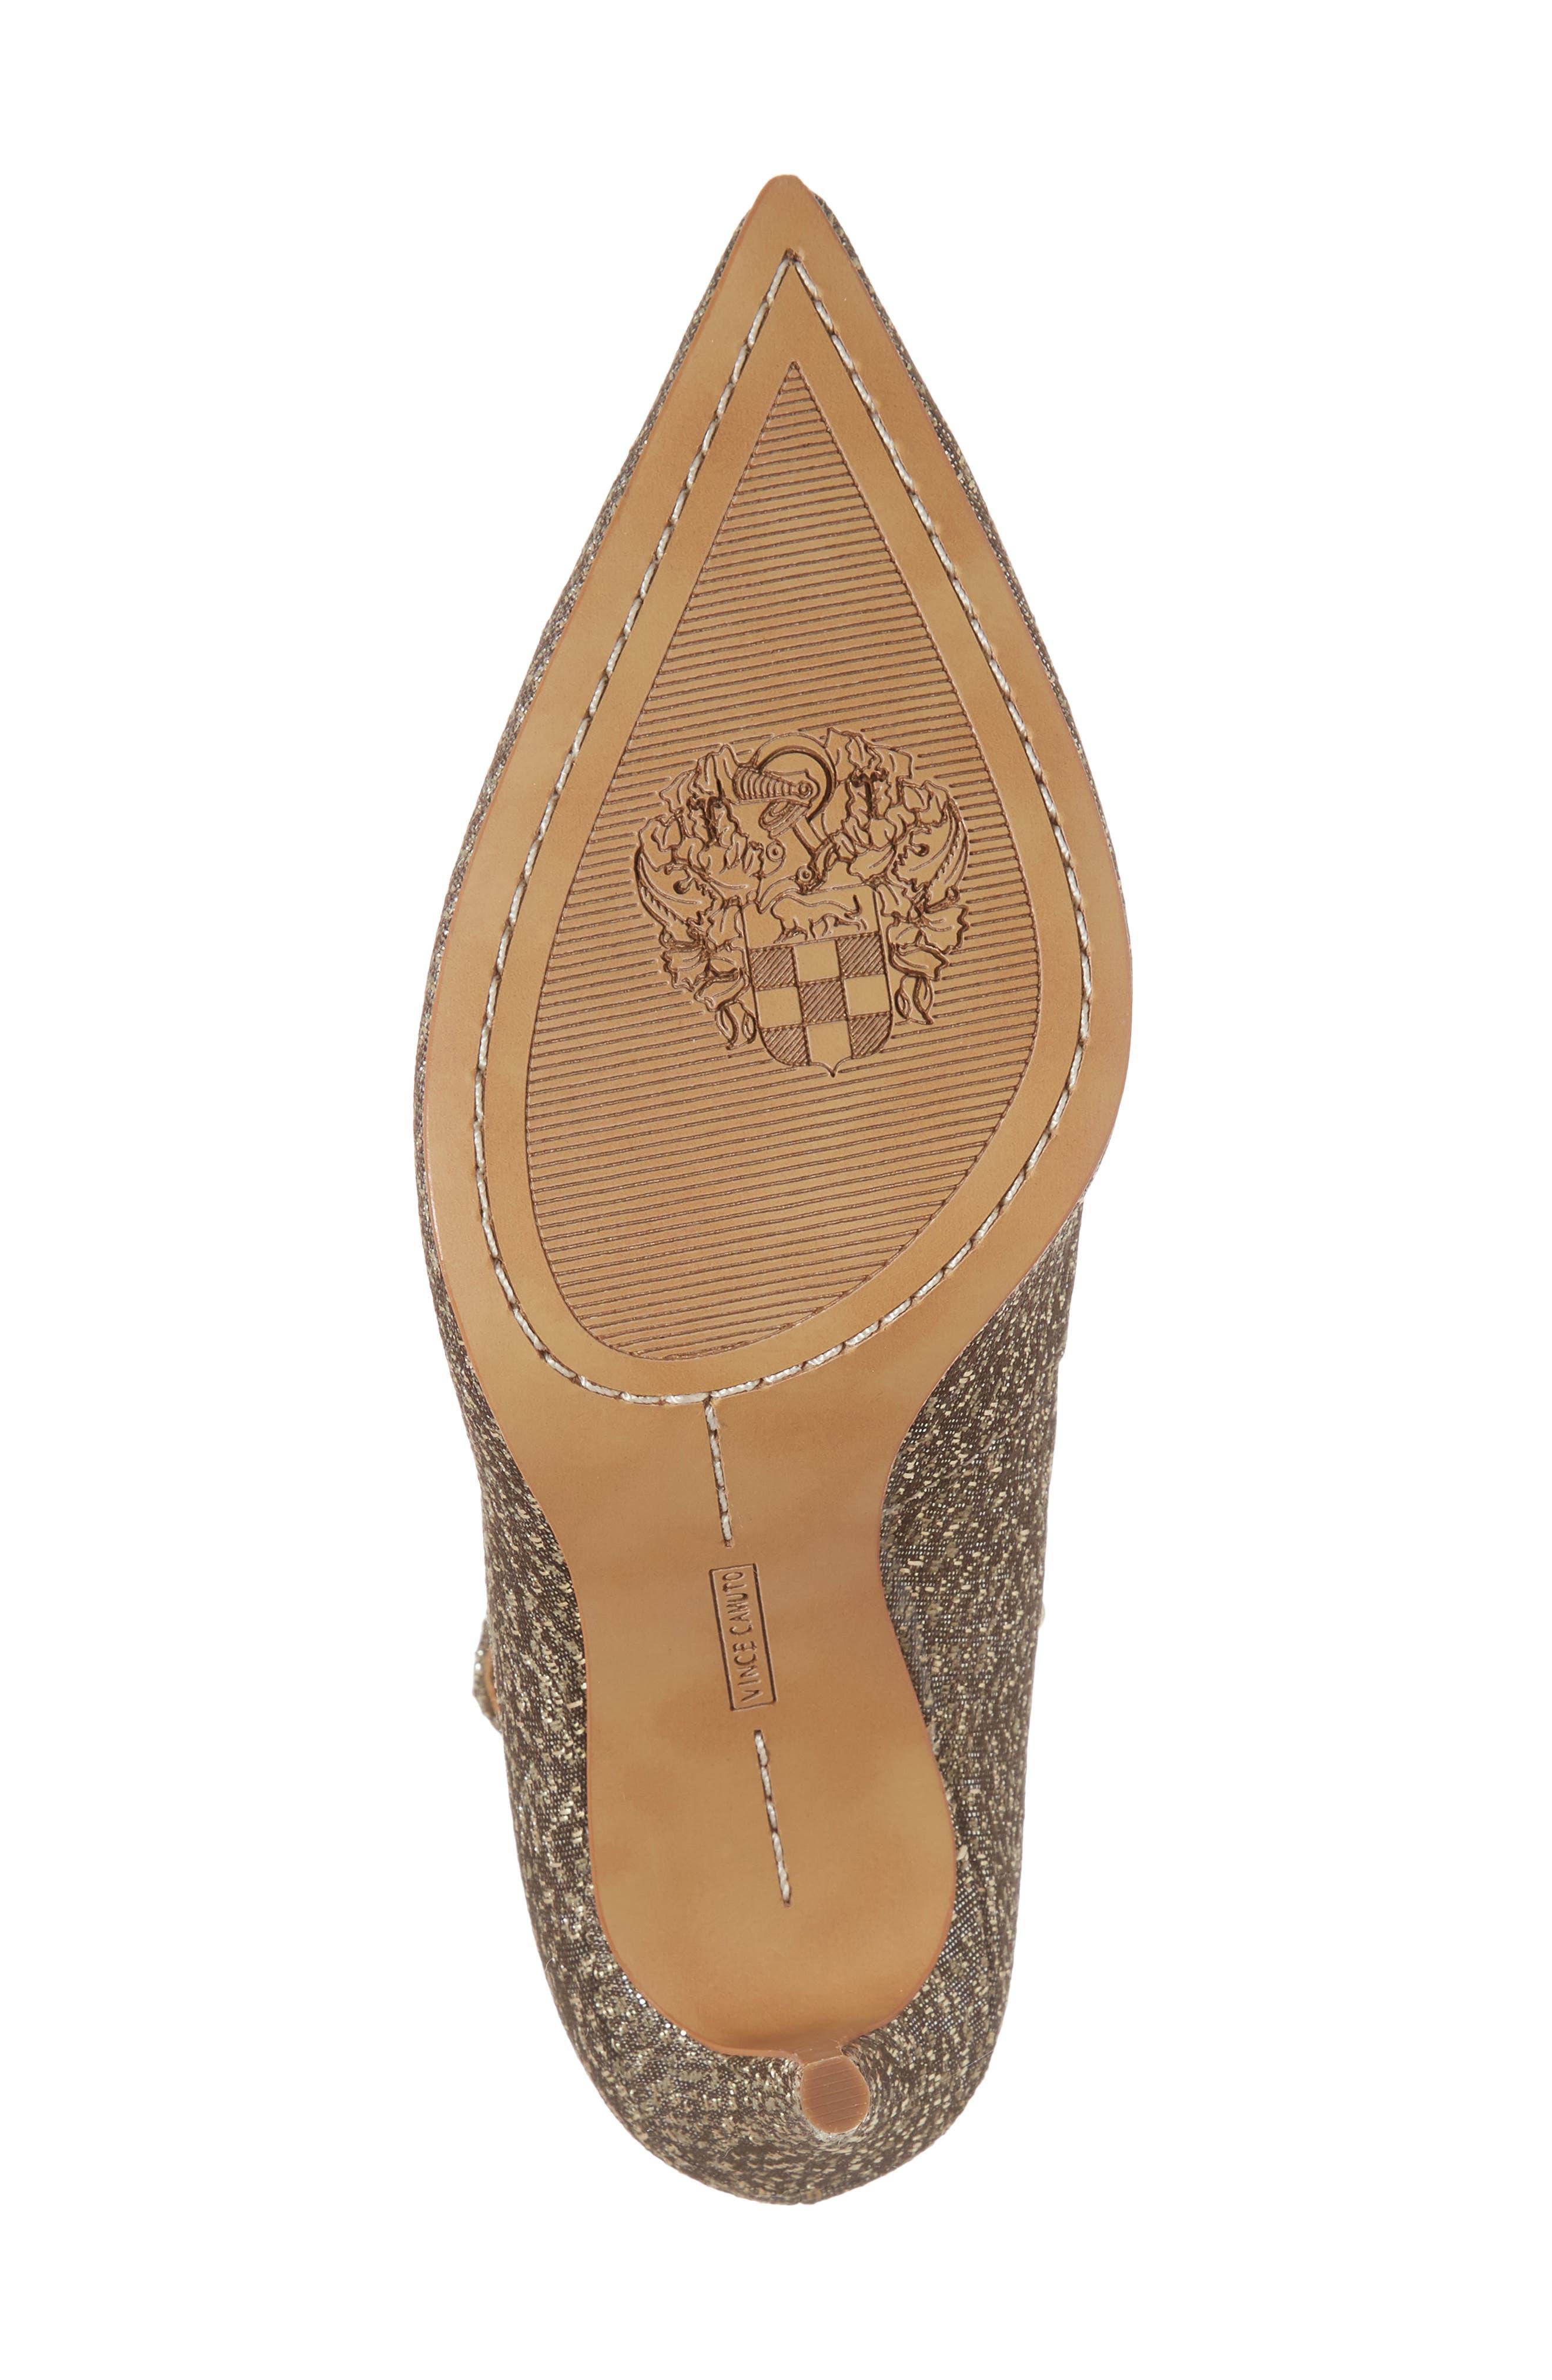 Vine Camuto Jassita Ankle Strap Pump,                             Alternate thumbnail 6, color,                             Bronze